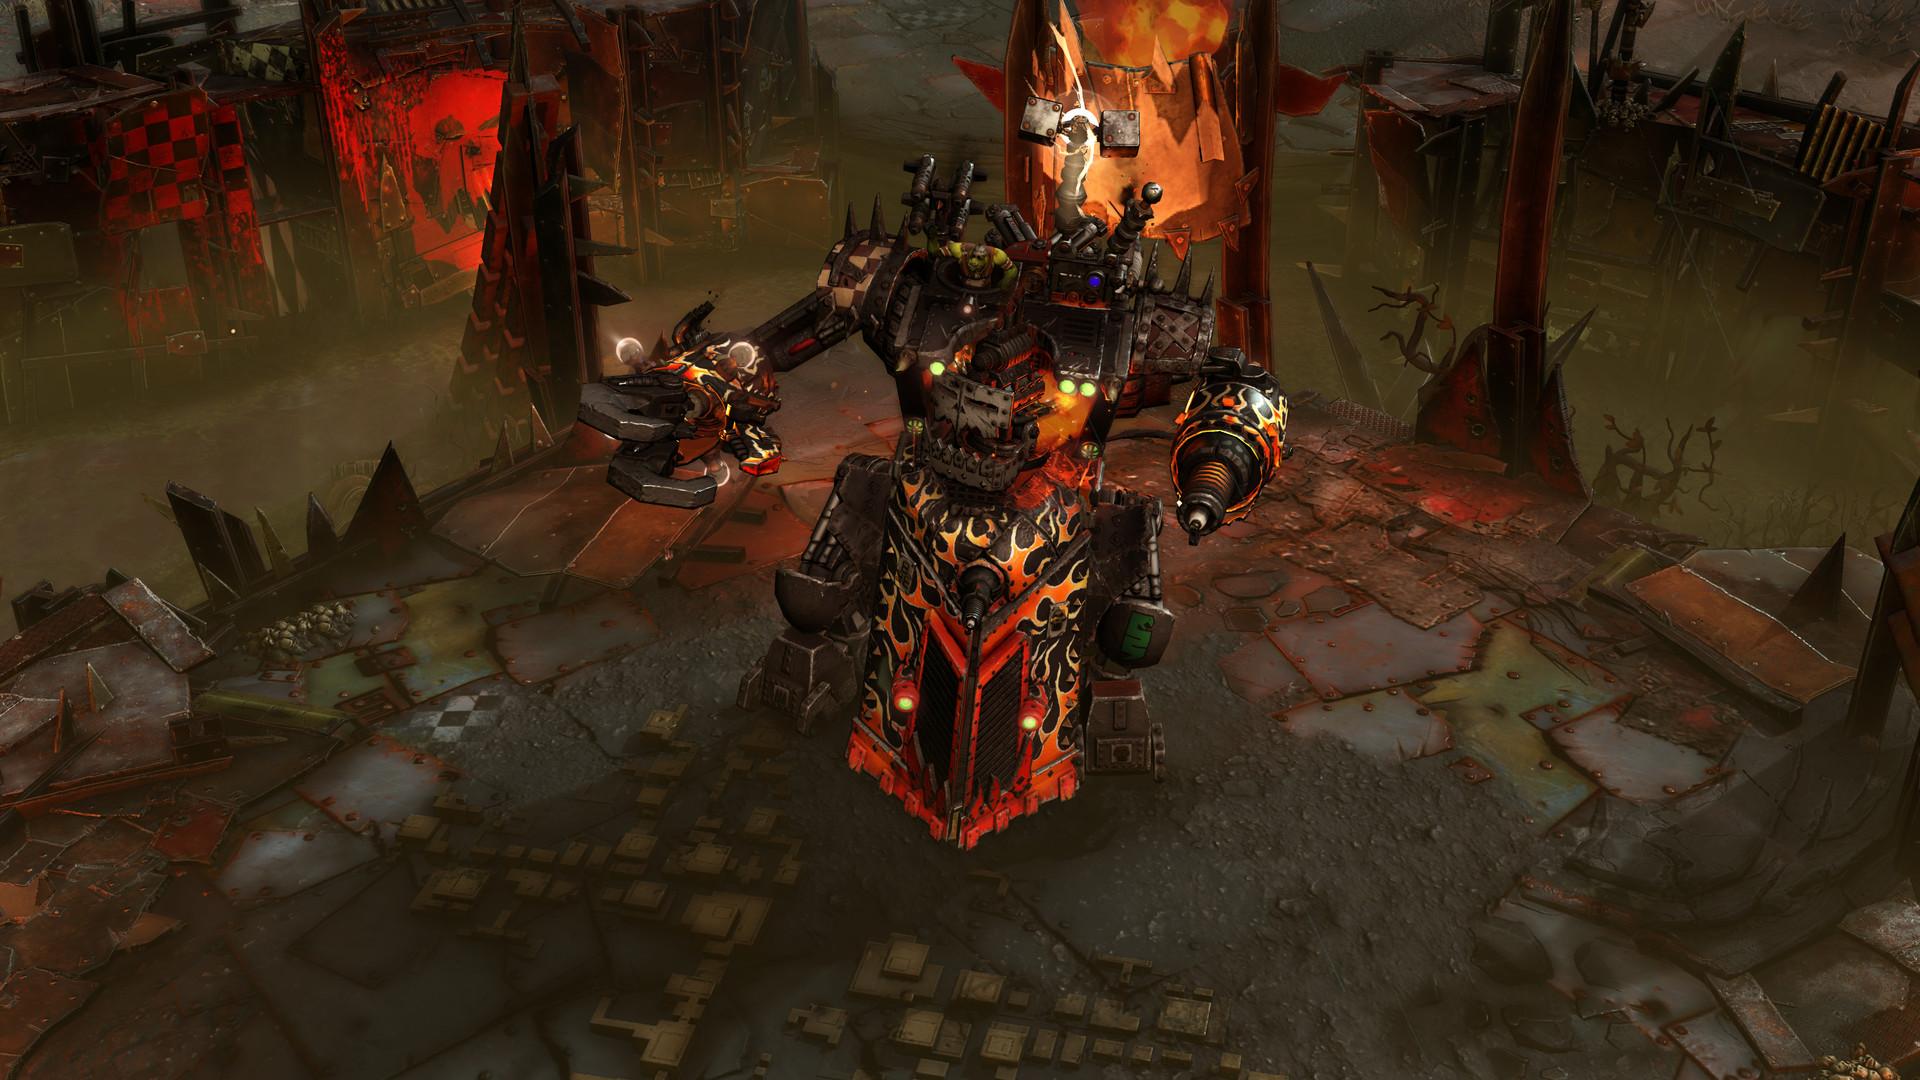 Скриншот к игре Warhammer 40,000: Dawn of War III (2017) PC   RePack от R.G. Механики